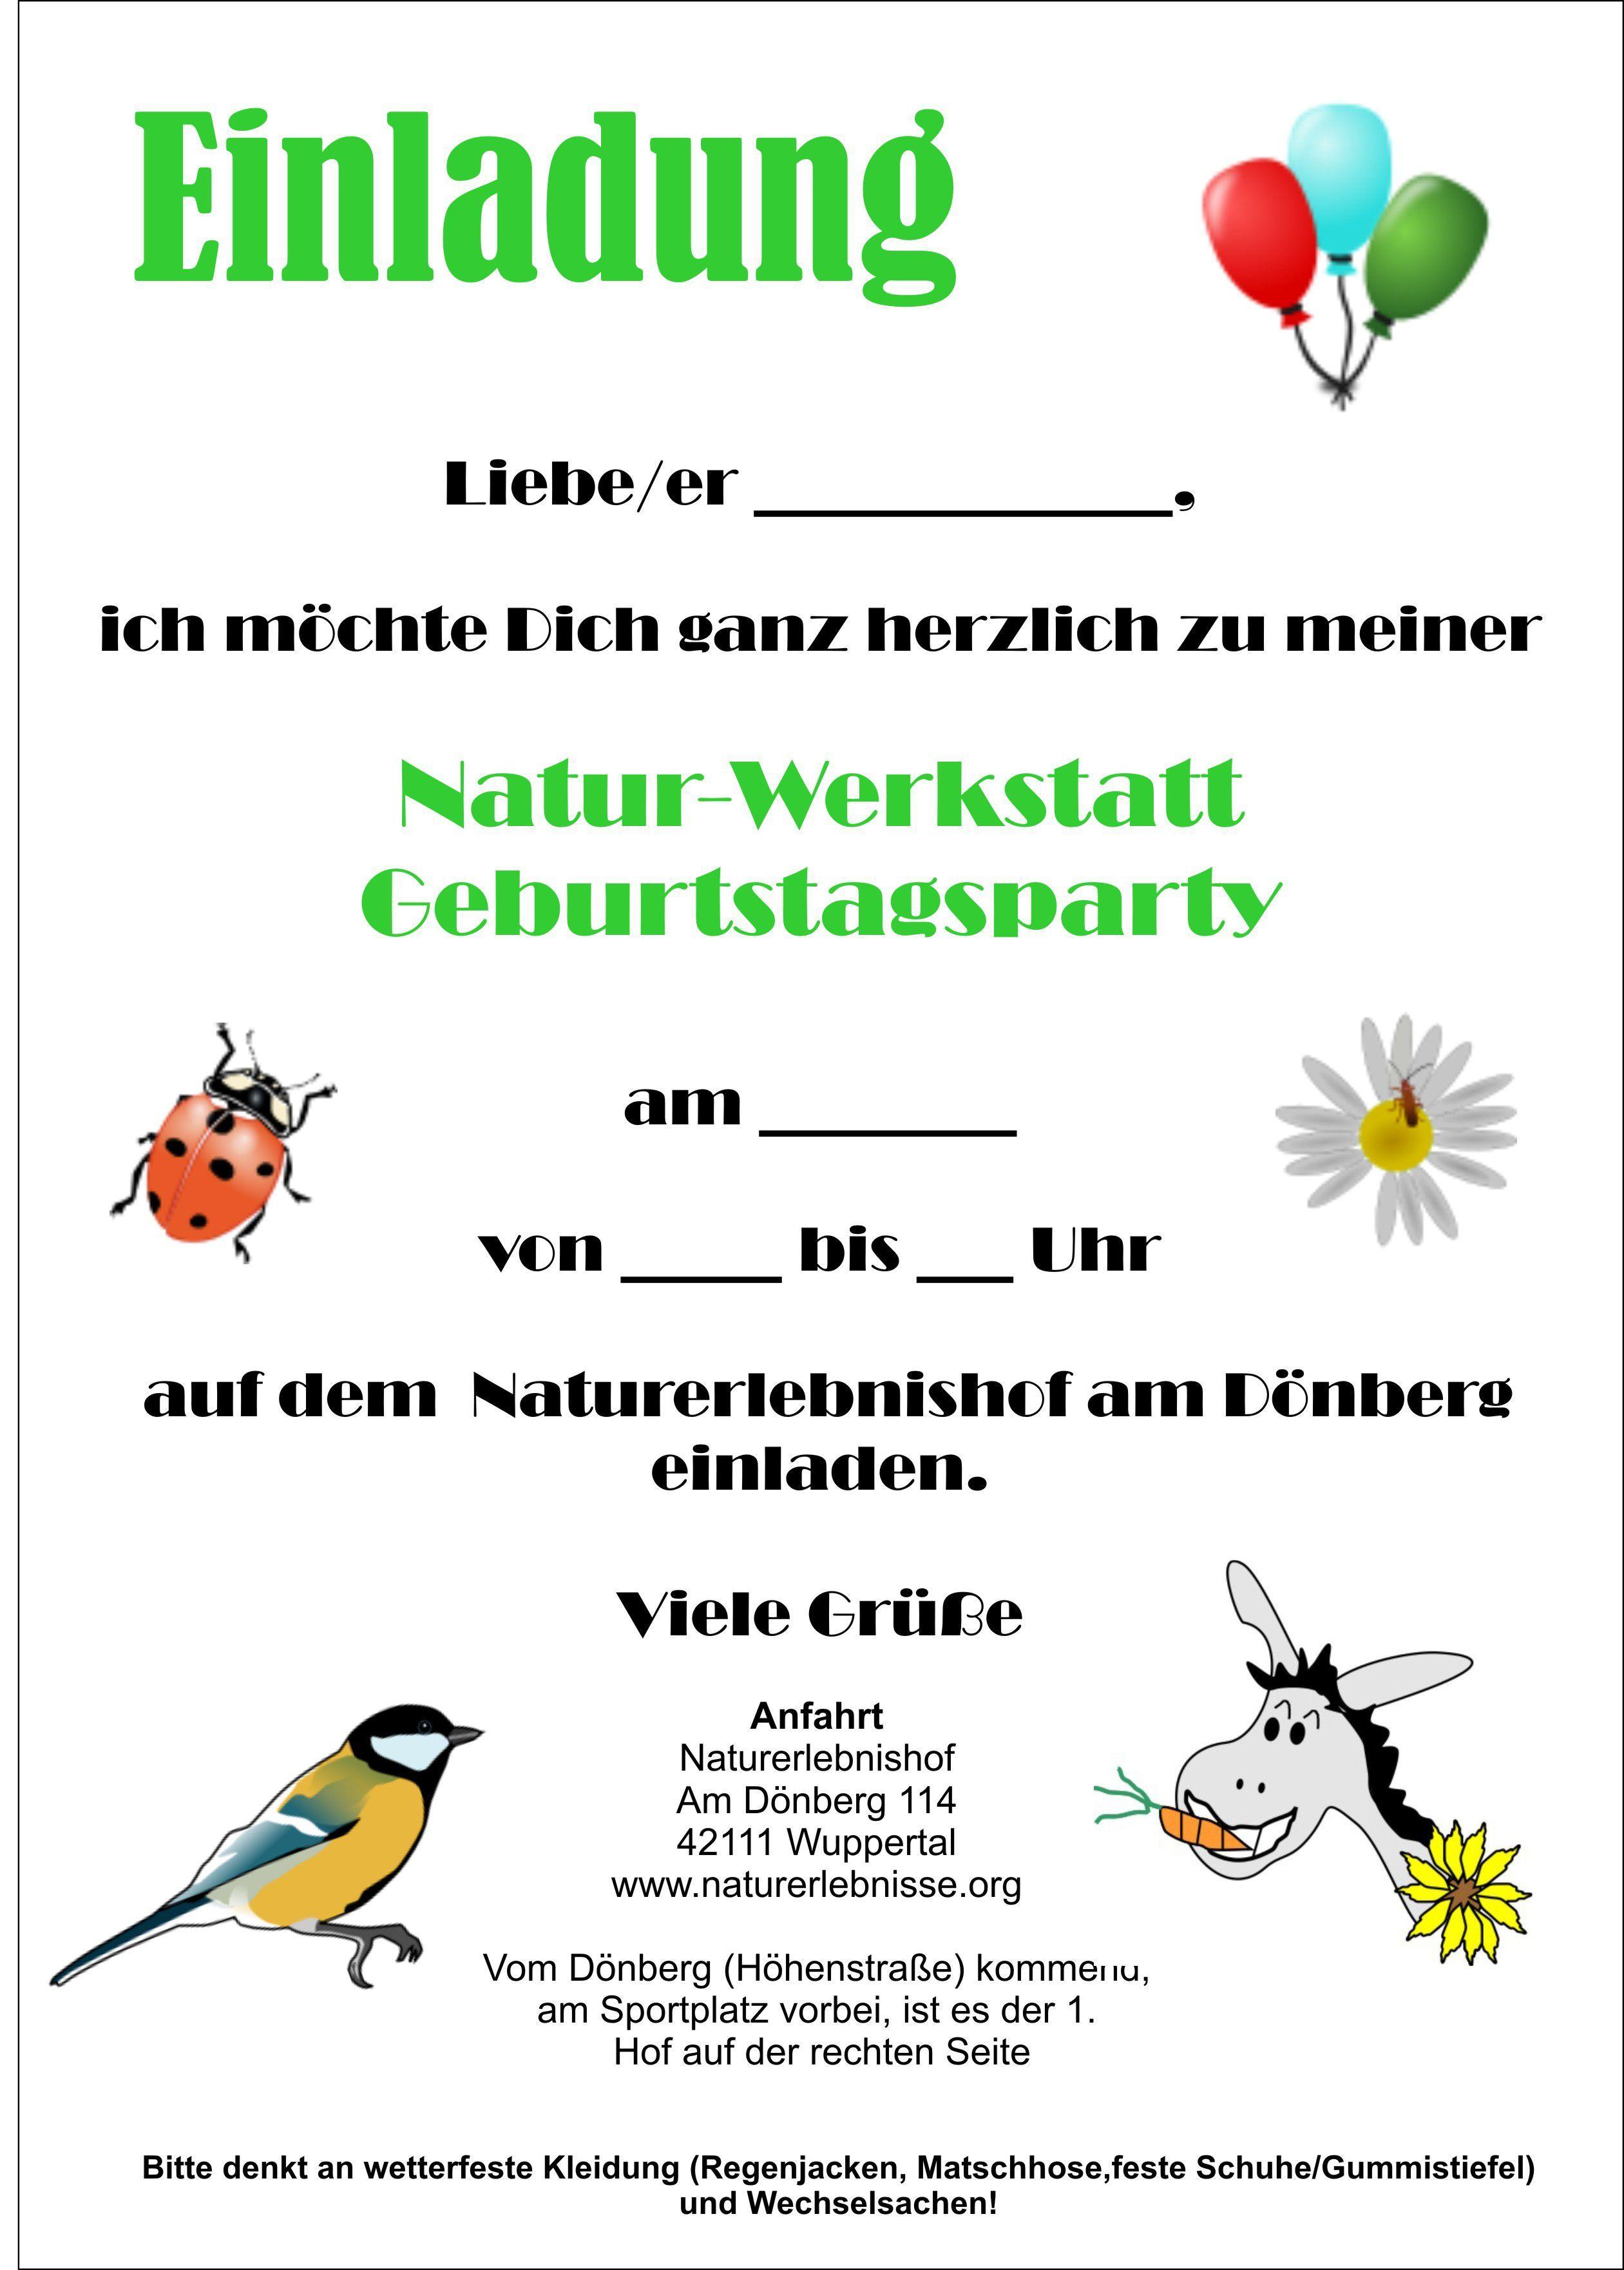 marvelous einladung kindergeburtstag natur #1: Text Einladung Kindergeburtstag Ohne Eltern